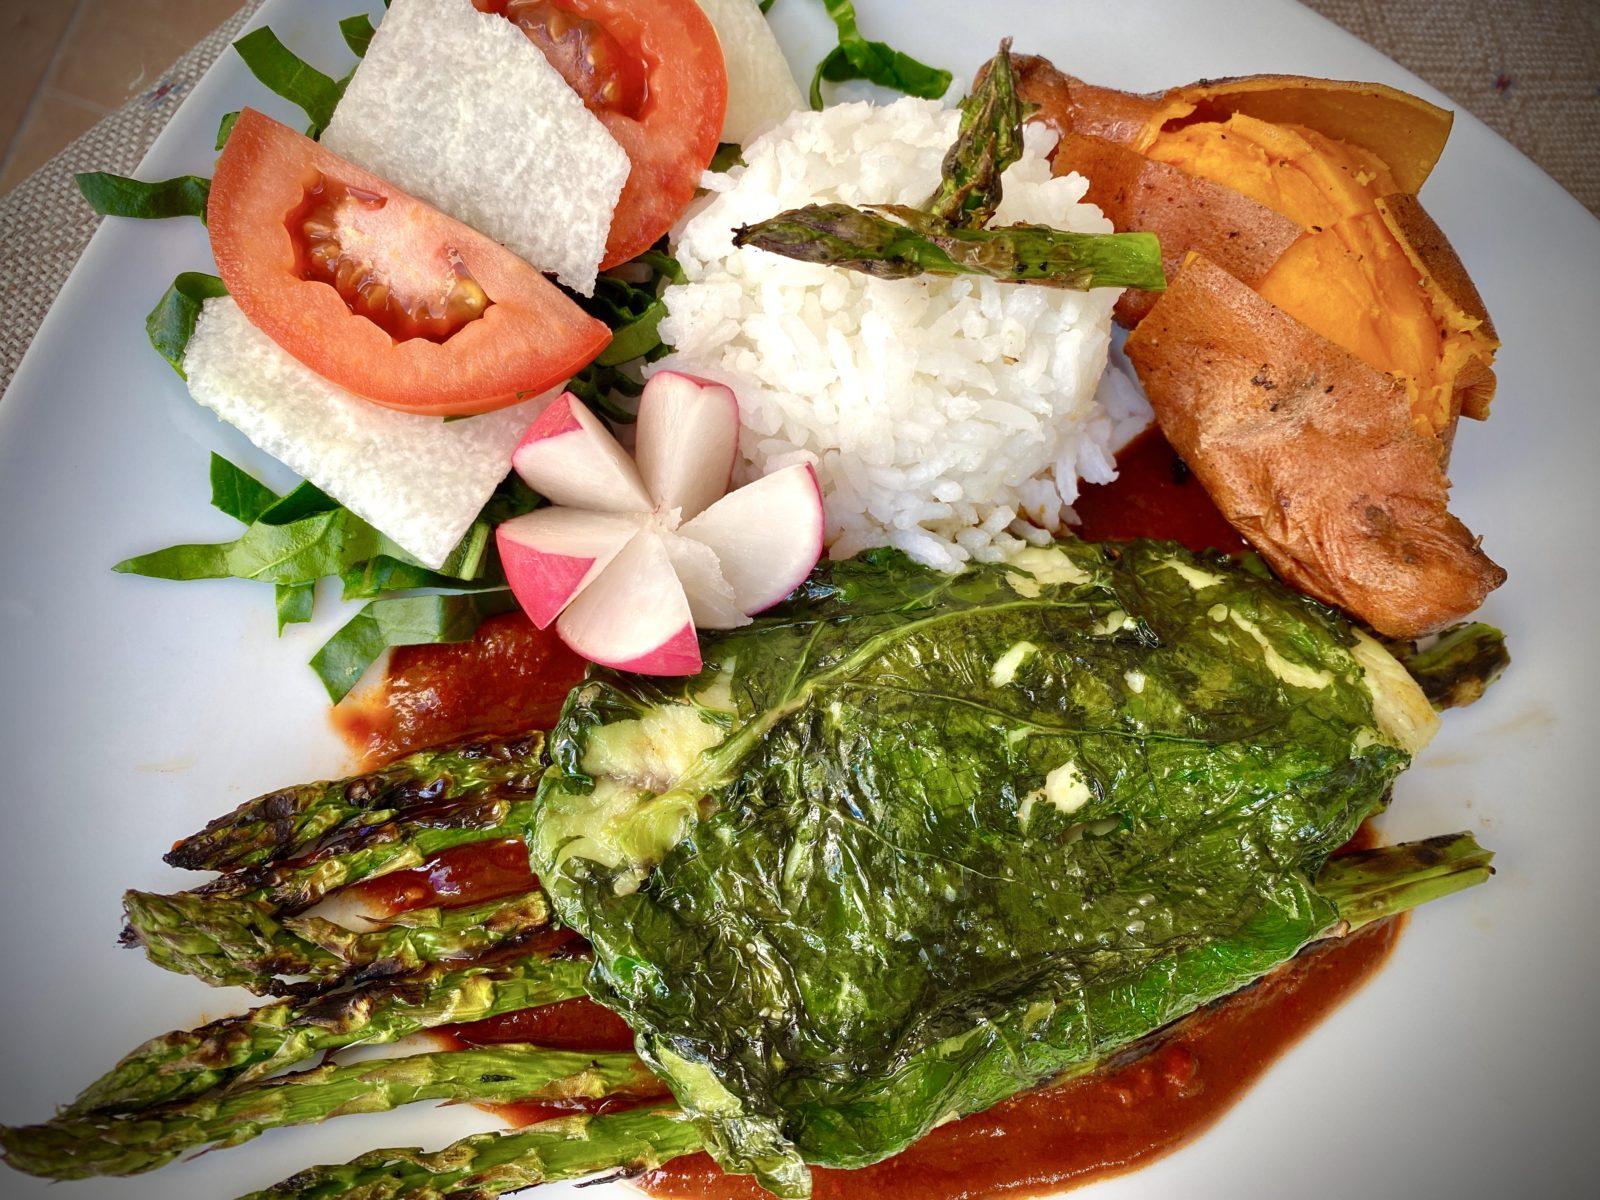 Filete de pescado en hoja santa con salsa de chile pasilla